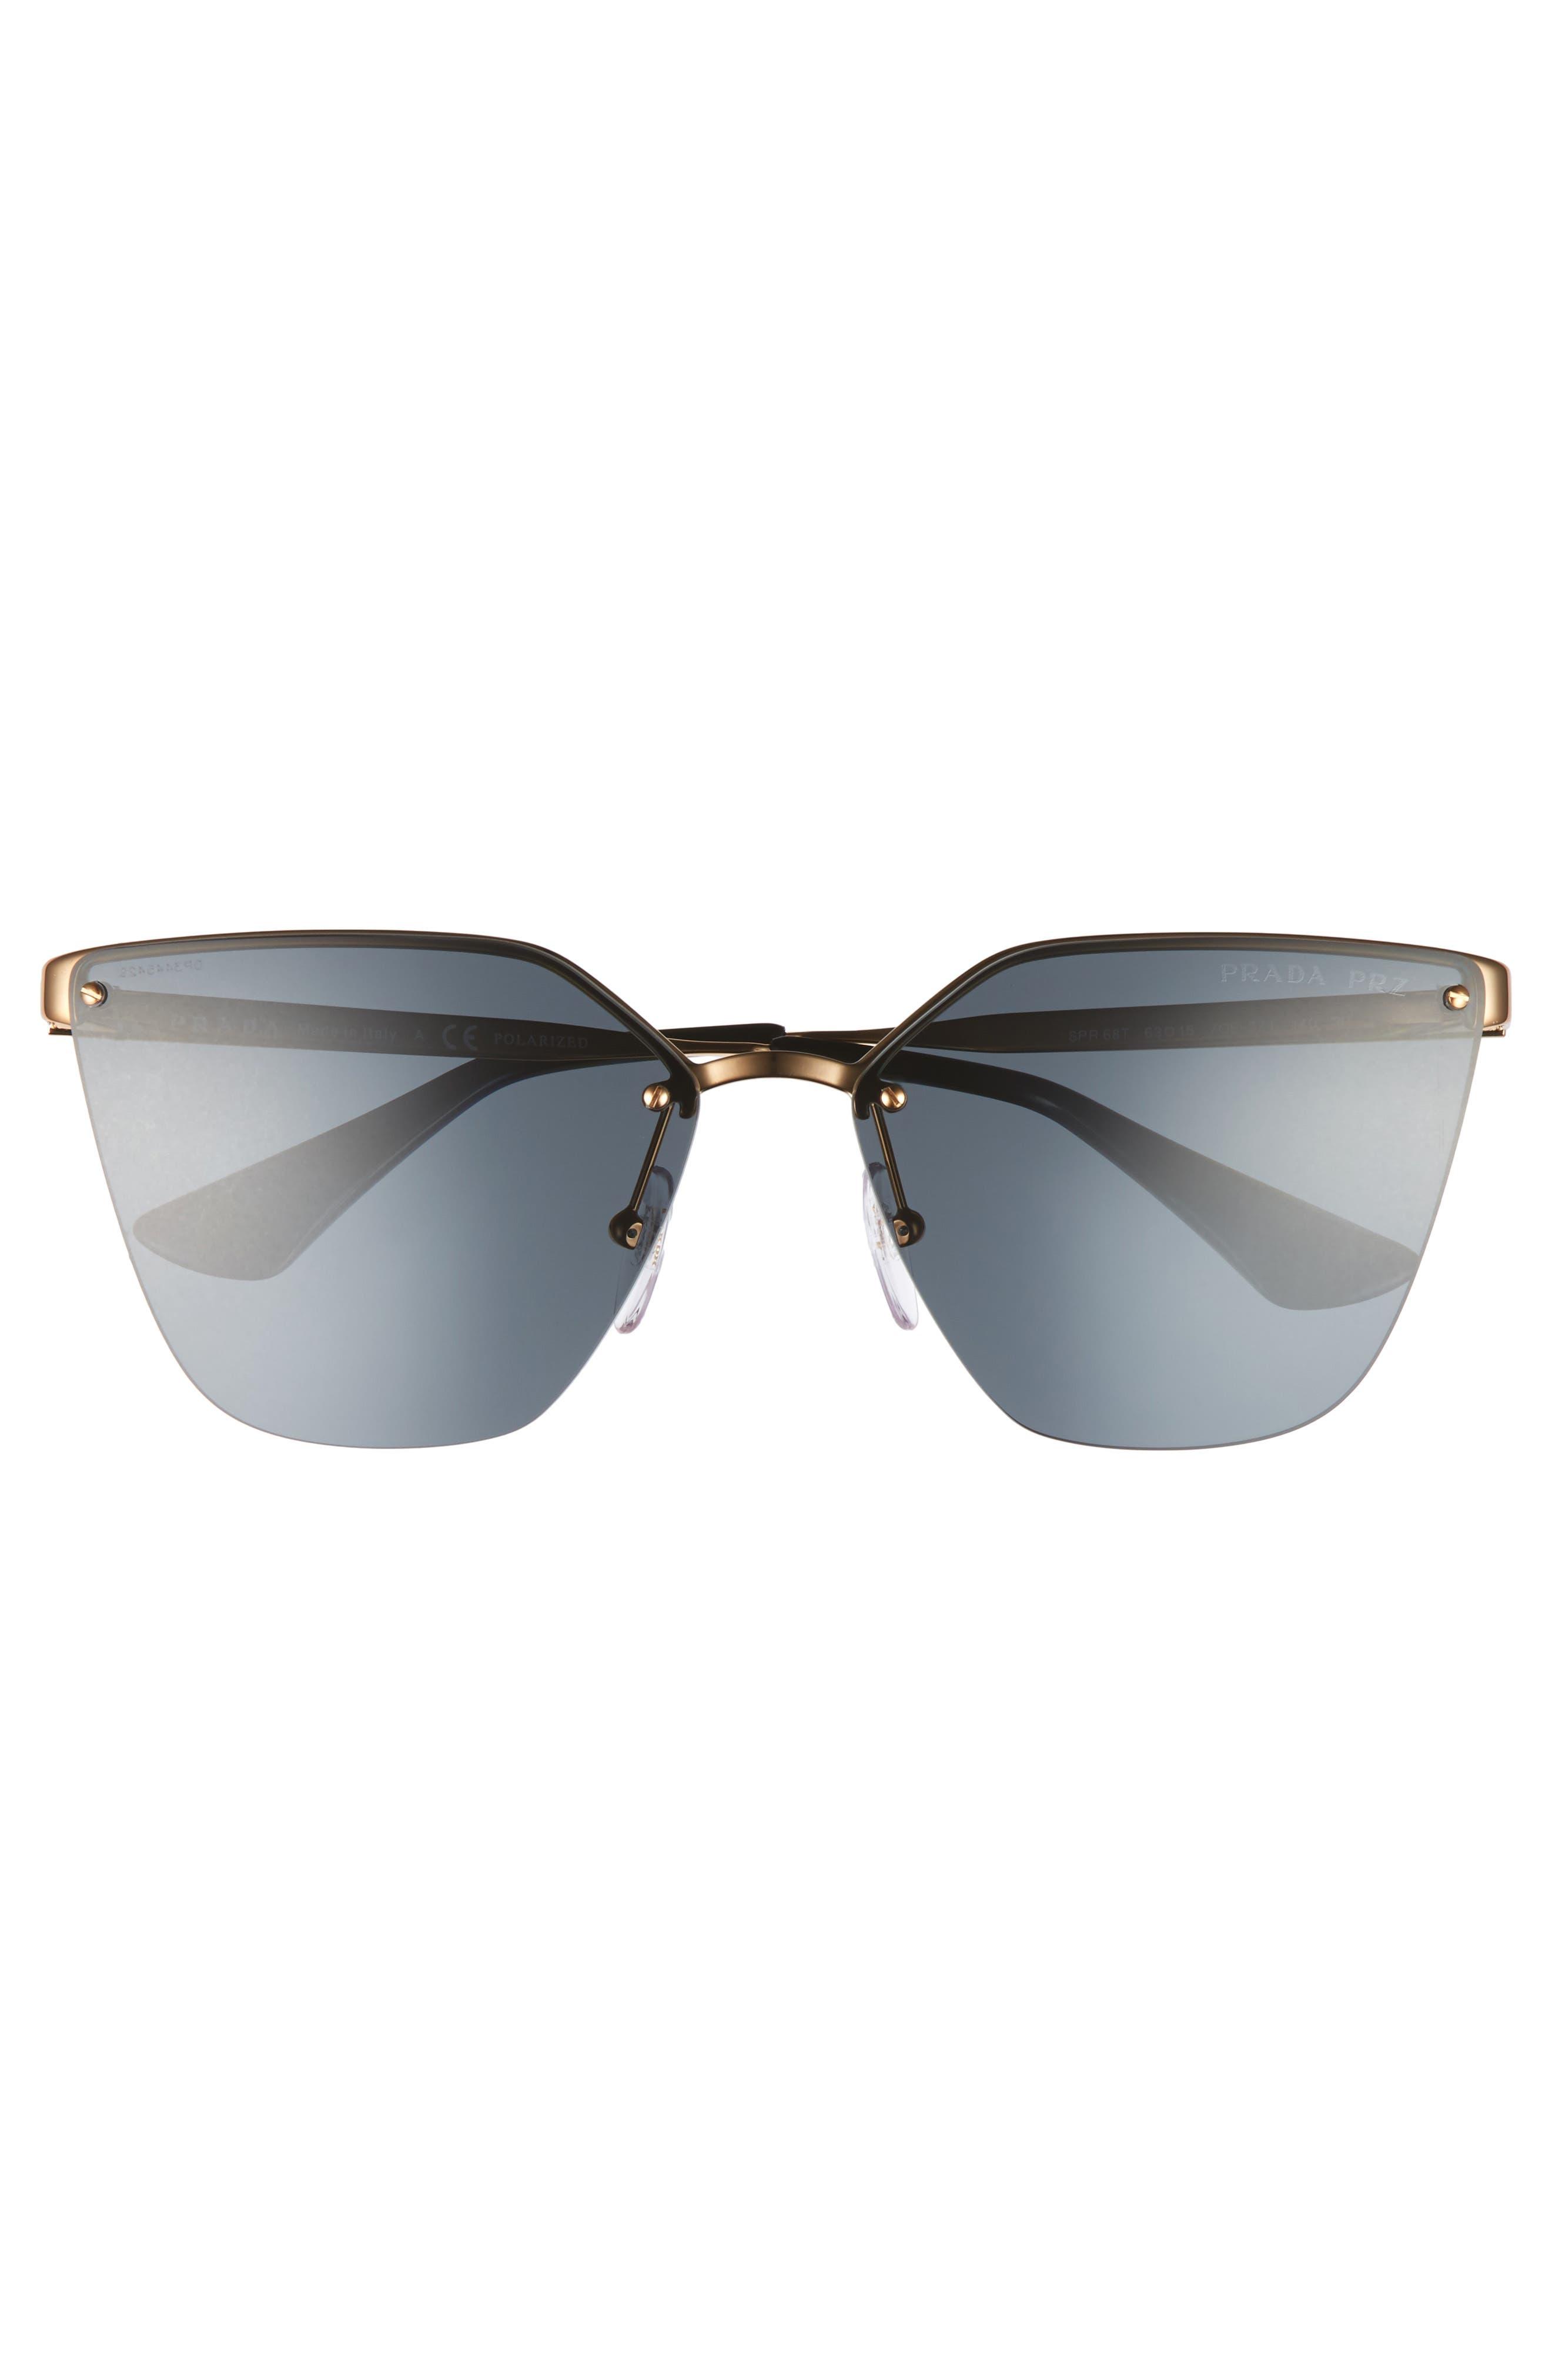 63mm Oversize Rimless Sunglasses,                             Alternate thumbnail 3, color,                             Black/ Green